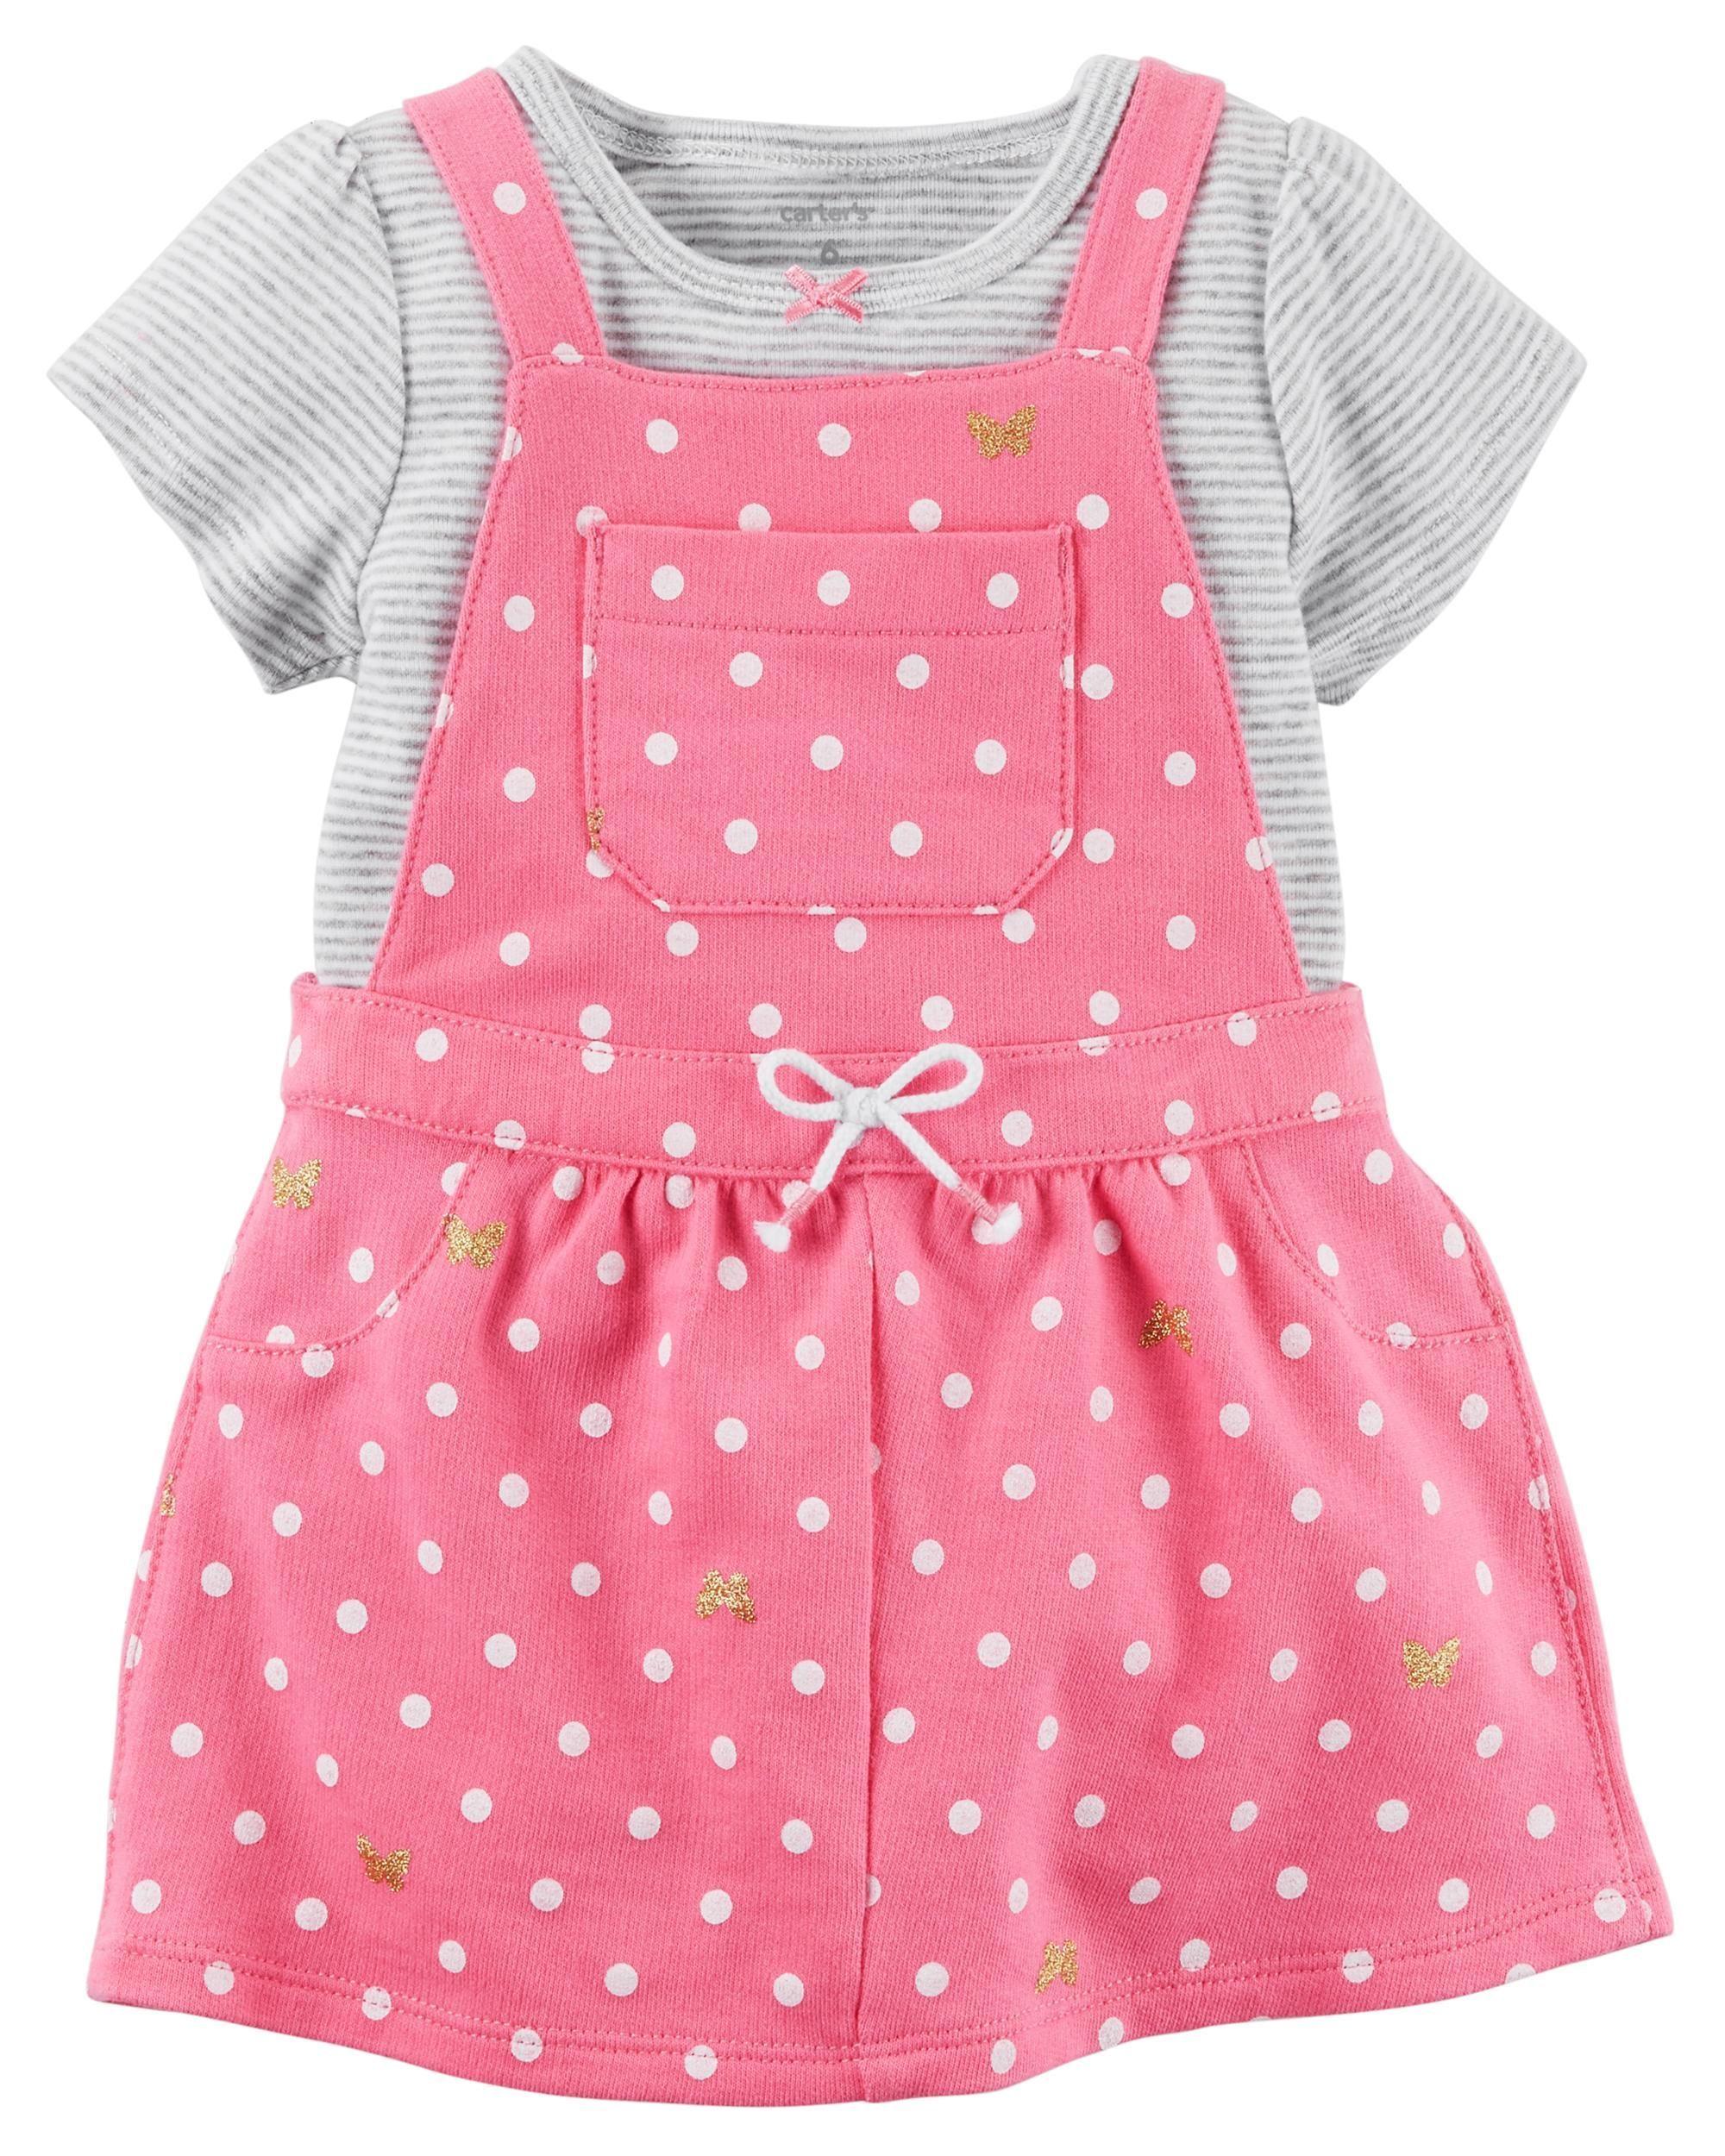 6f545901c 2-Piece Bodysuit & Jumper Set | Clothing | Carters baby girl ...